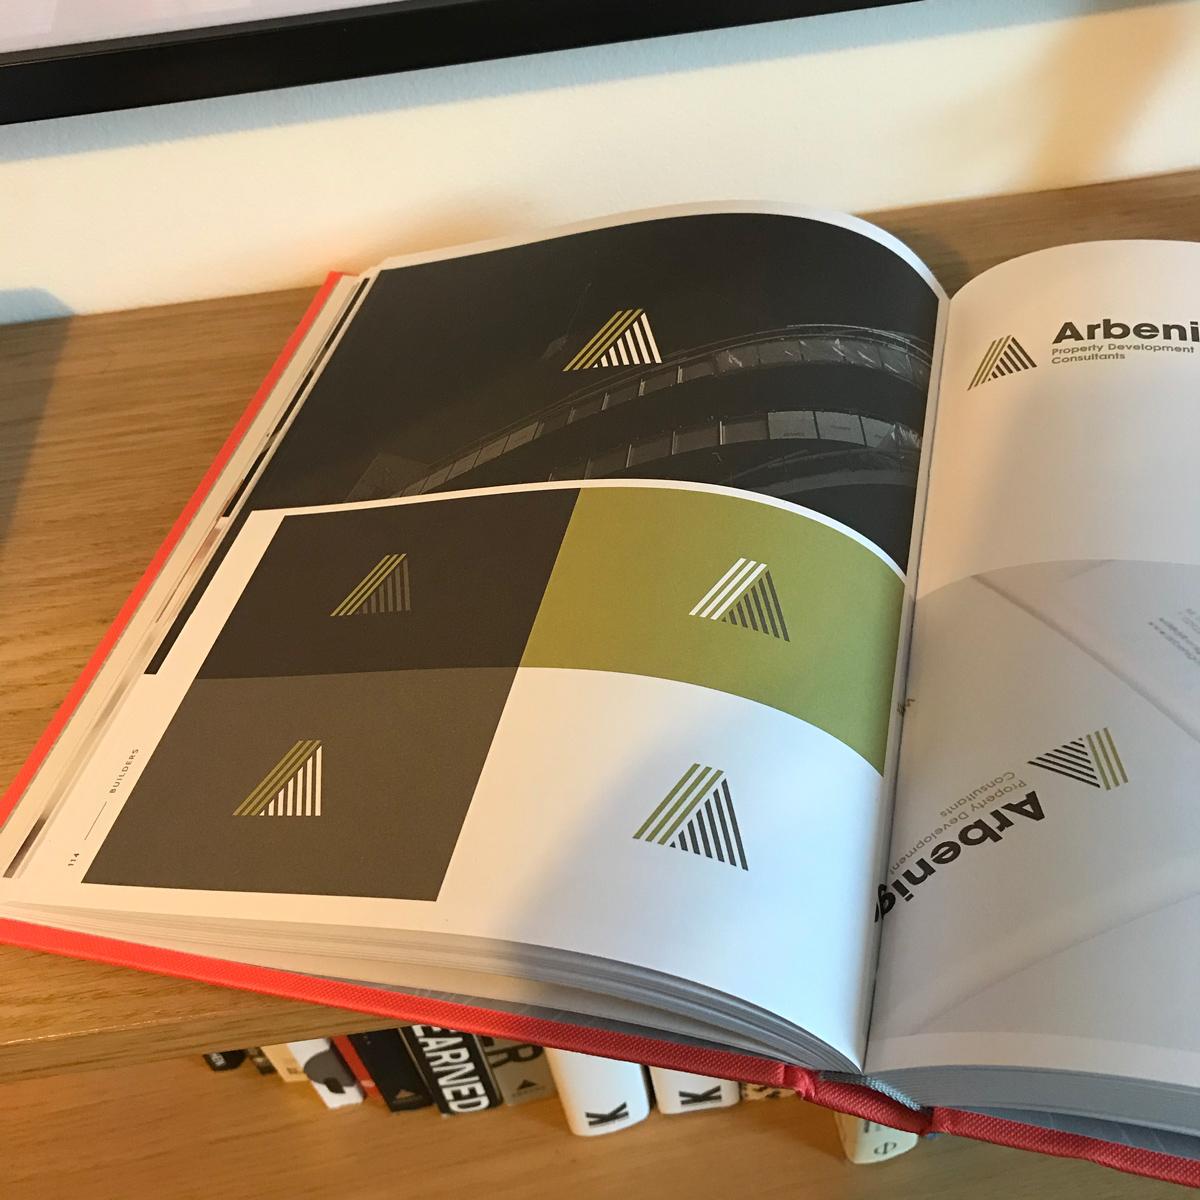 Branding work featured in Brand Built book